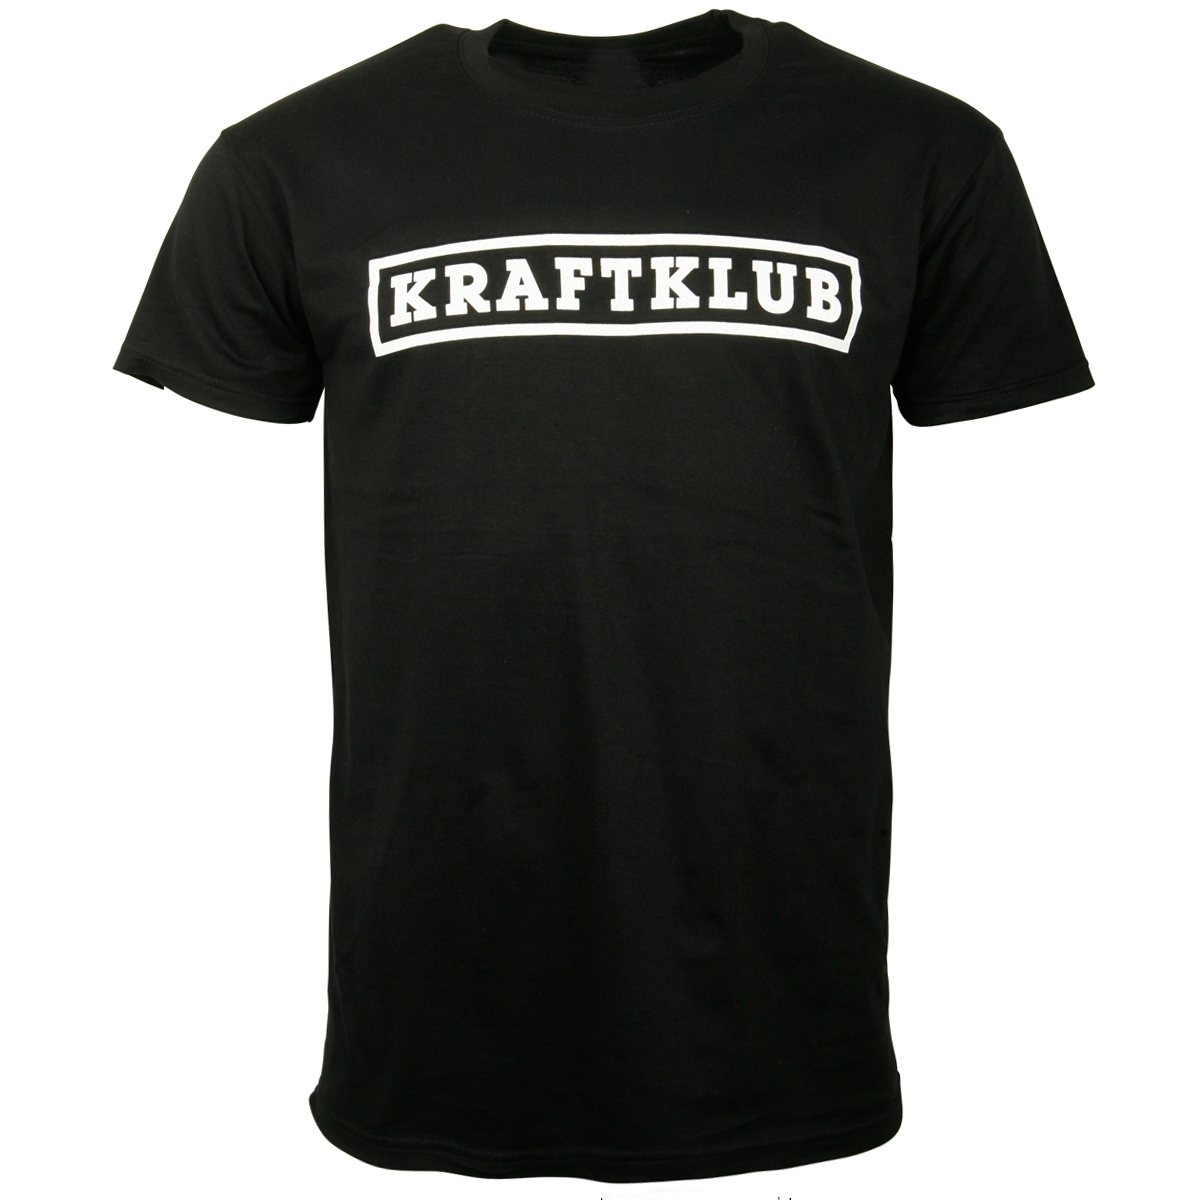 Kraftklub - T-Shirt Schriftzug - schwarz